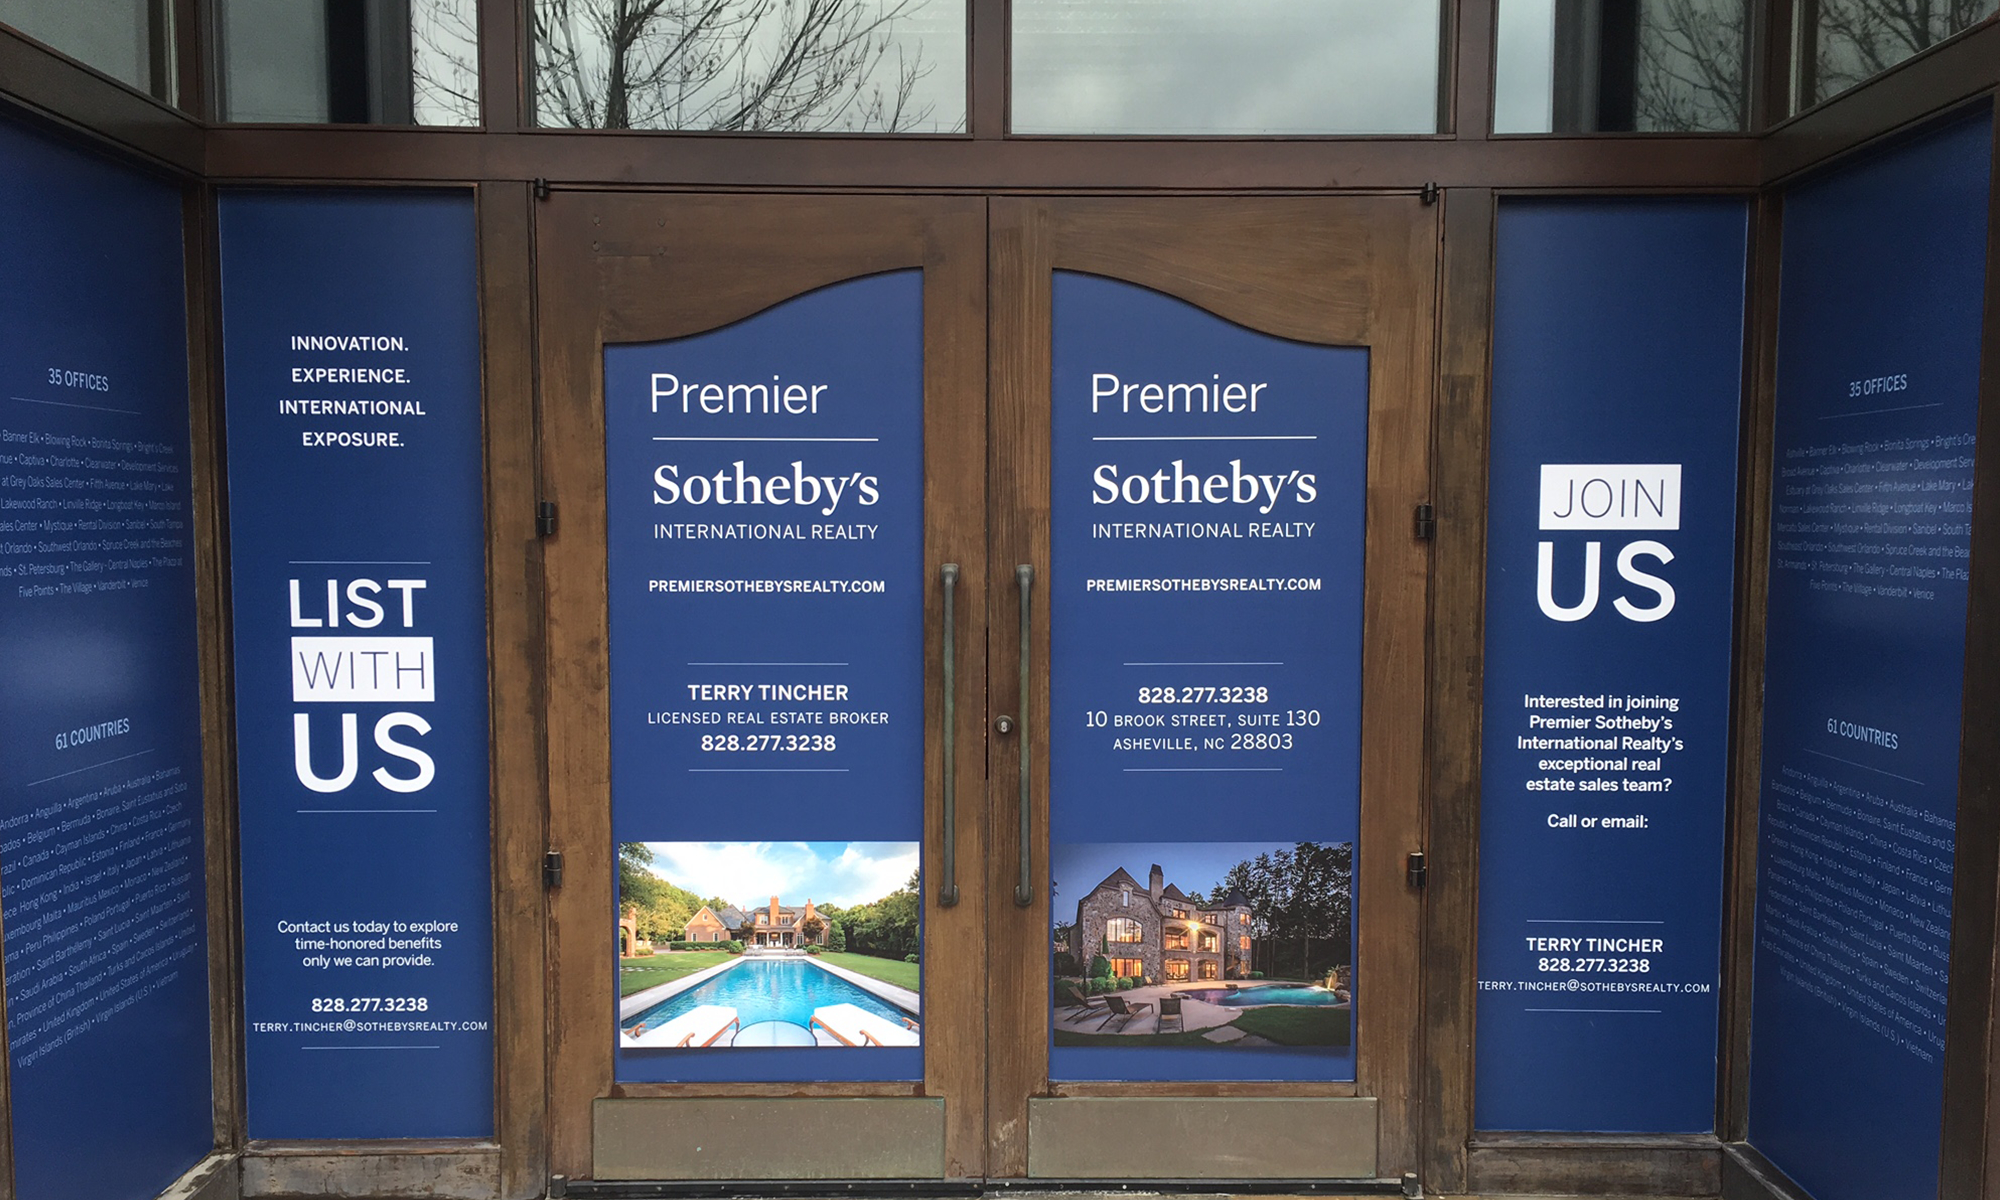 Premier Sotheby's International Realty Asheville